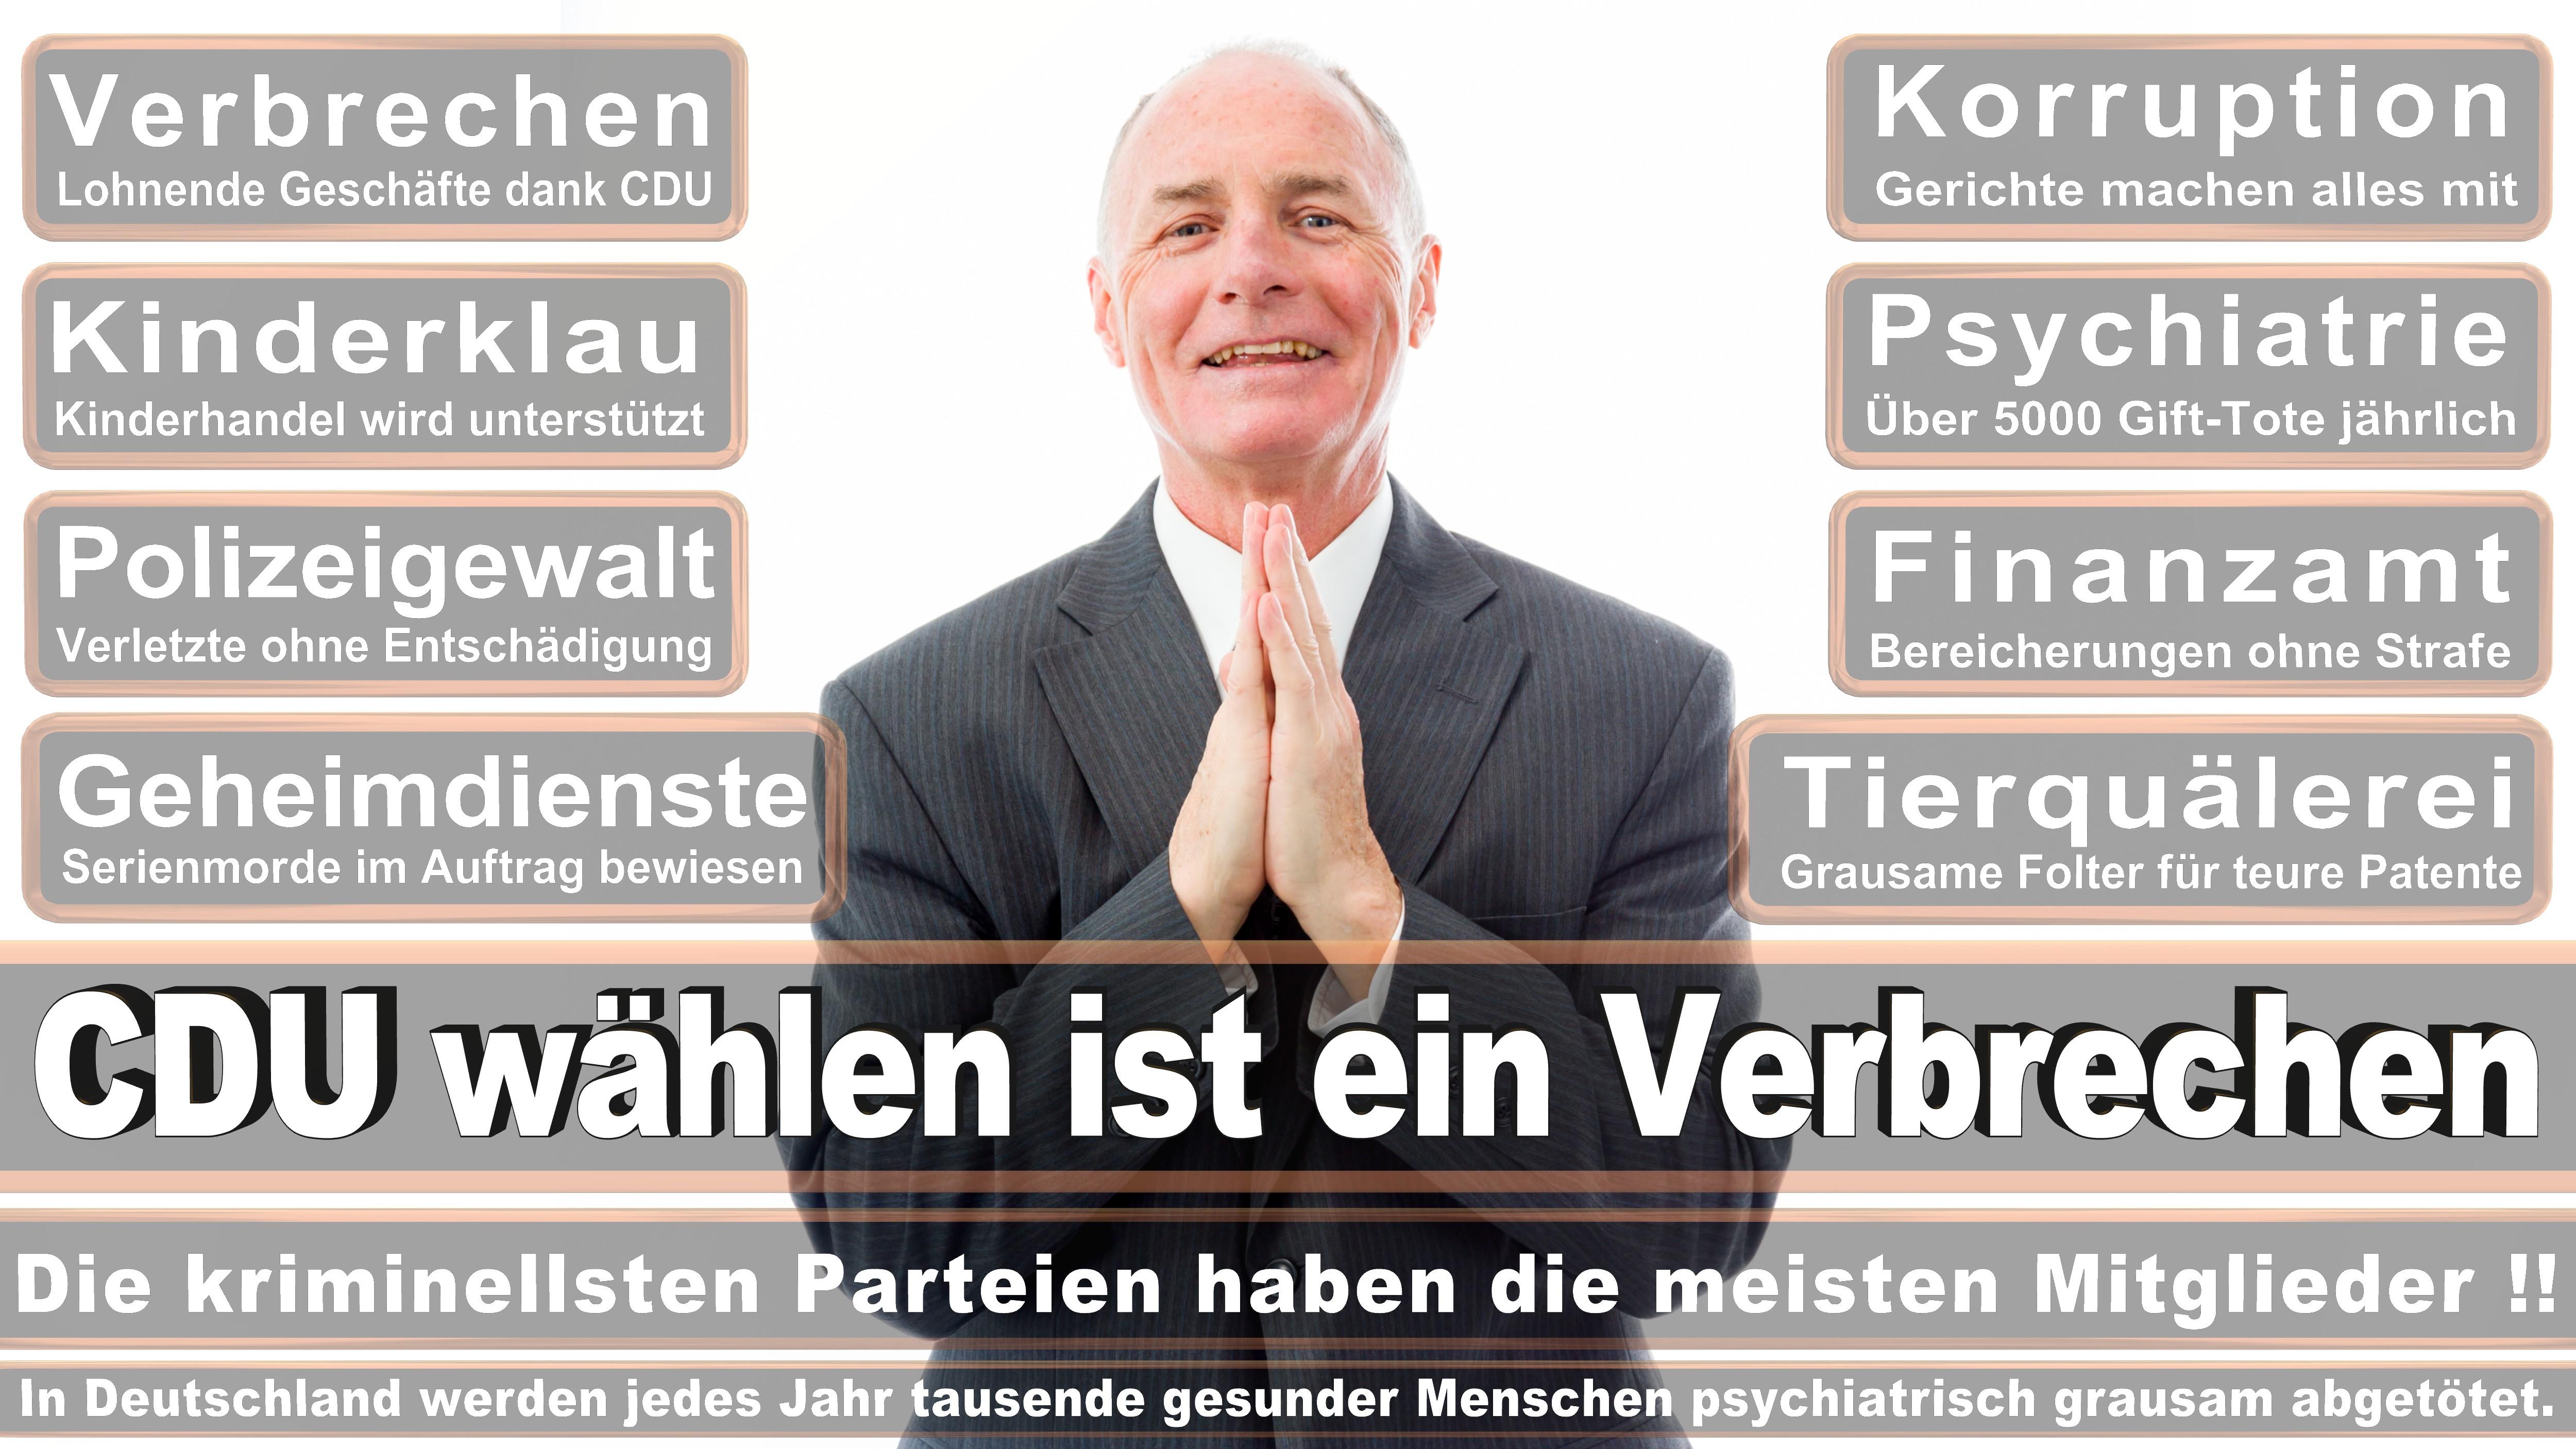 Kerstin Andreae GRÜNE Baden Württemberg Politiker Deutschland